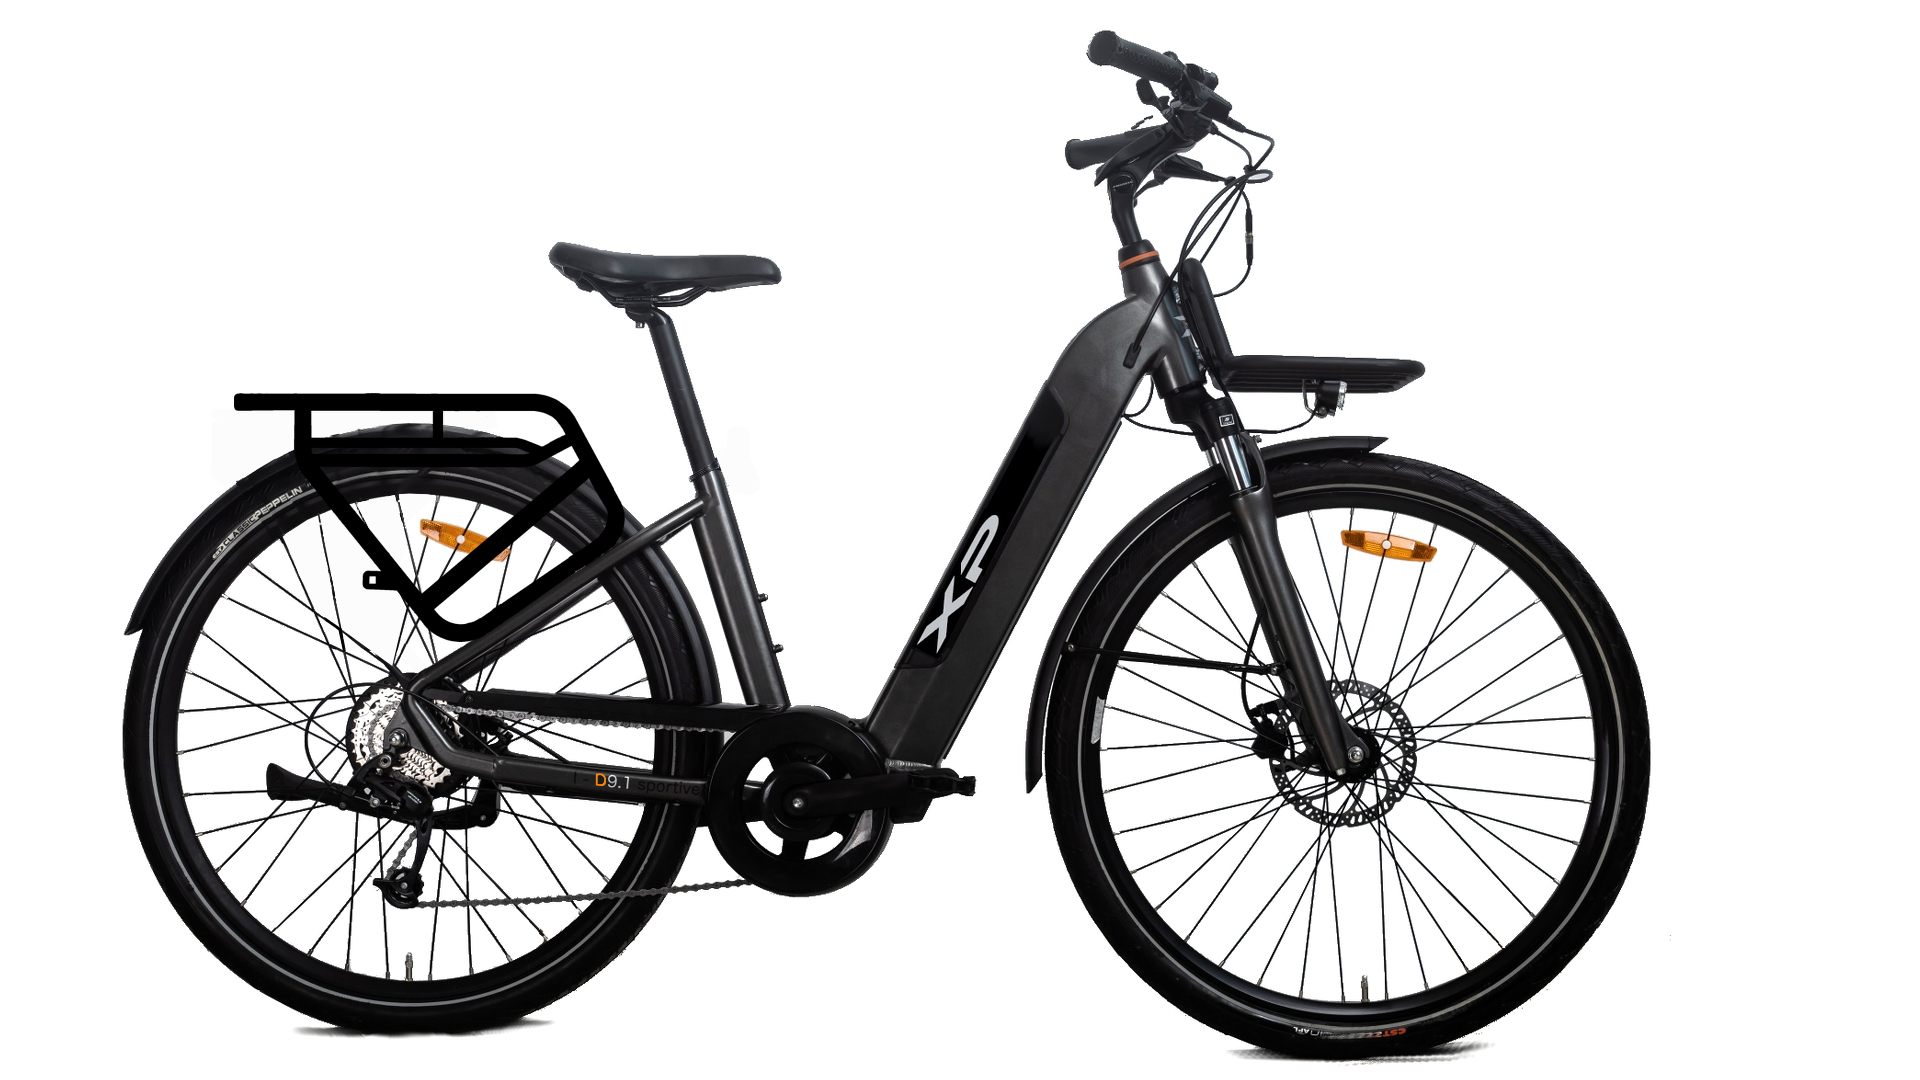 greenbike-pesaro-bici-elettriche-xp-bikes-i-d9.1-donna